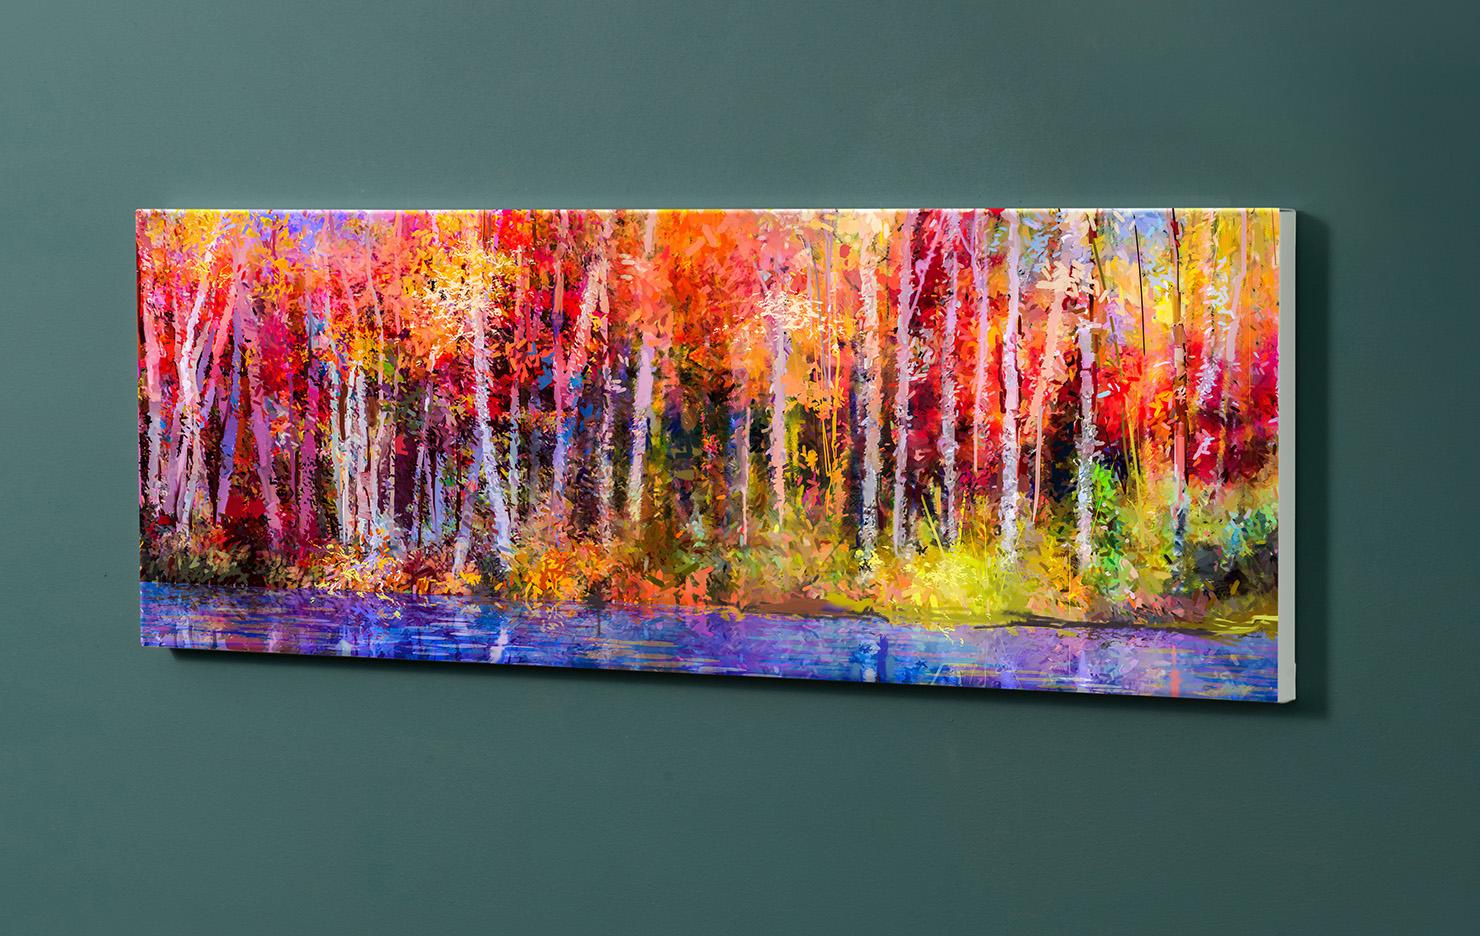 Magnettafel NOTIZ 90x30cm Motiv-Pinnwand M133 Kunst Gemälde